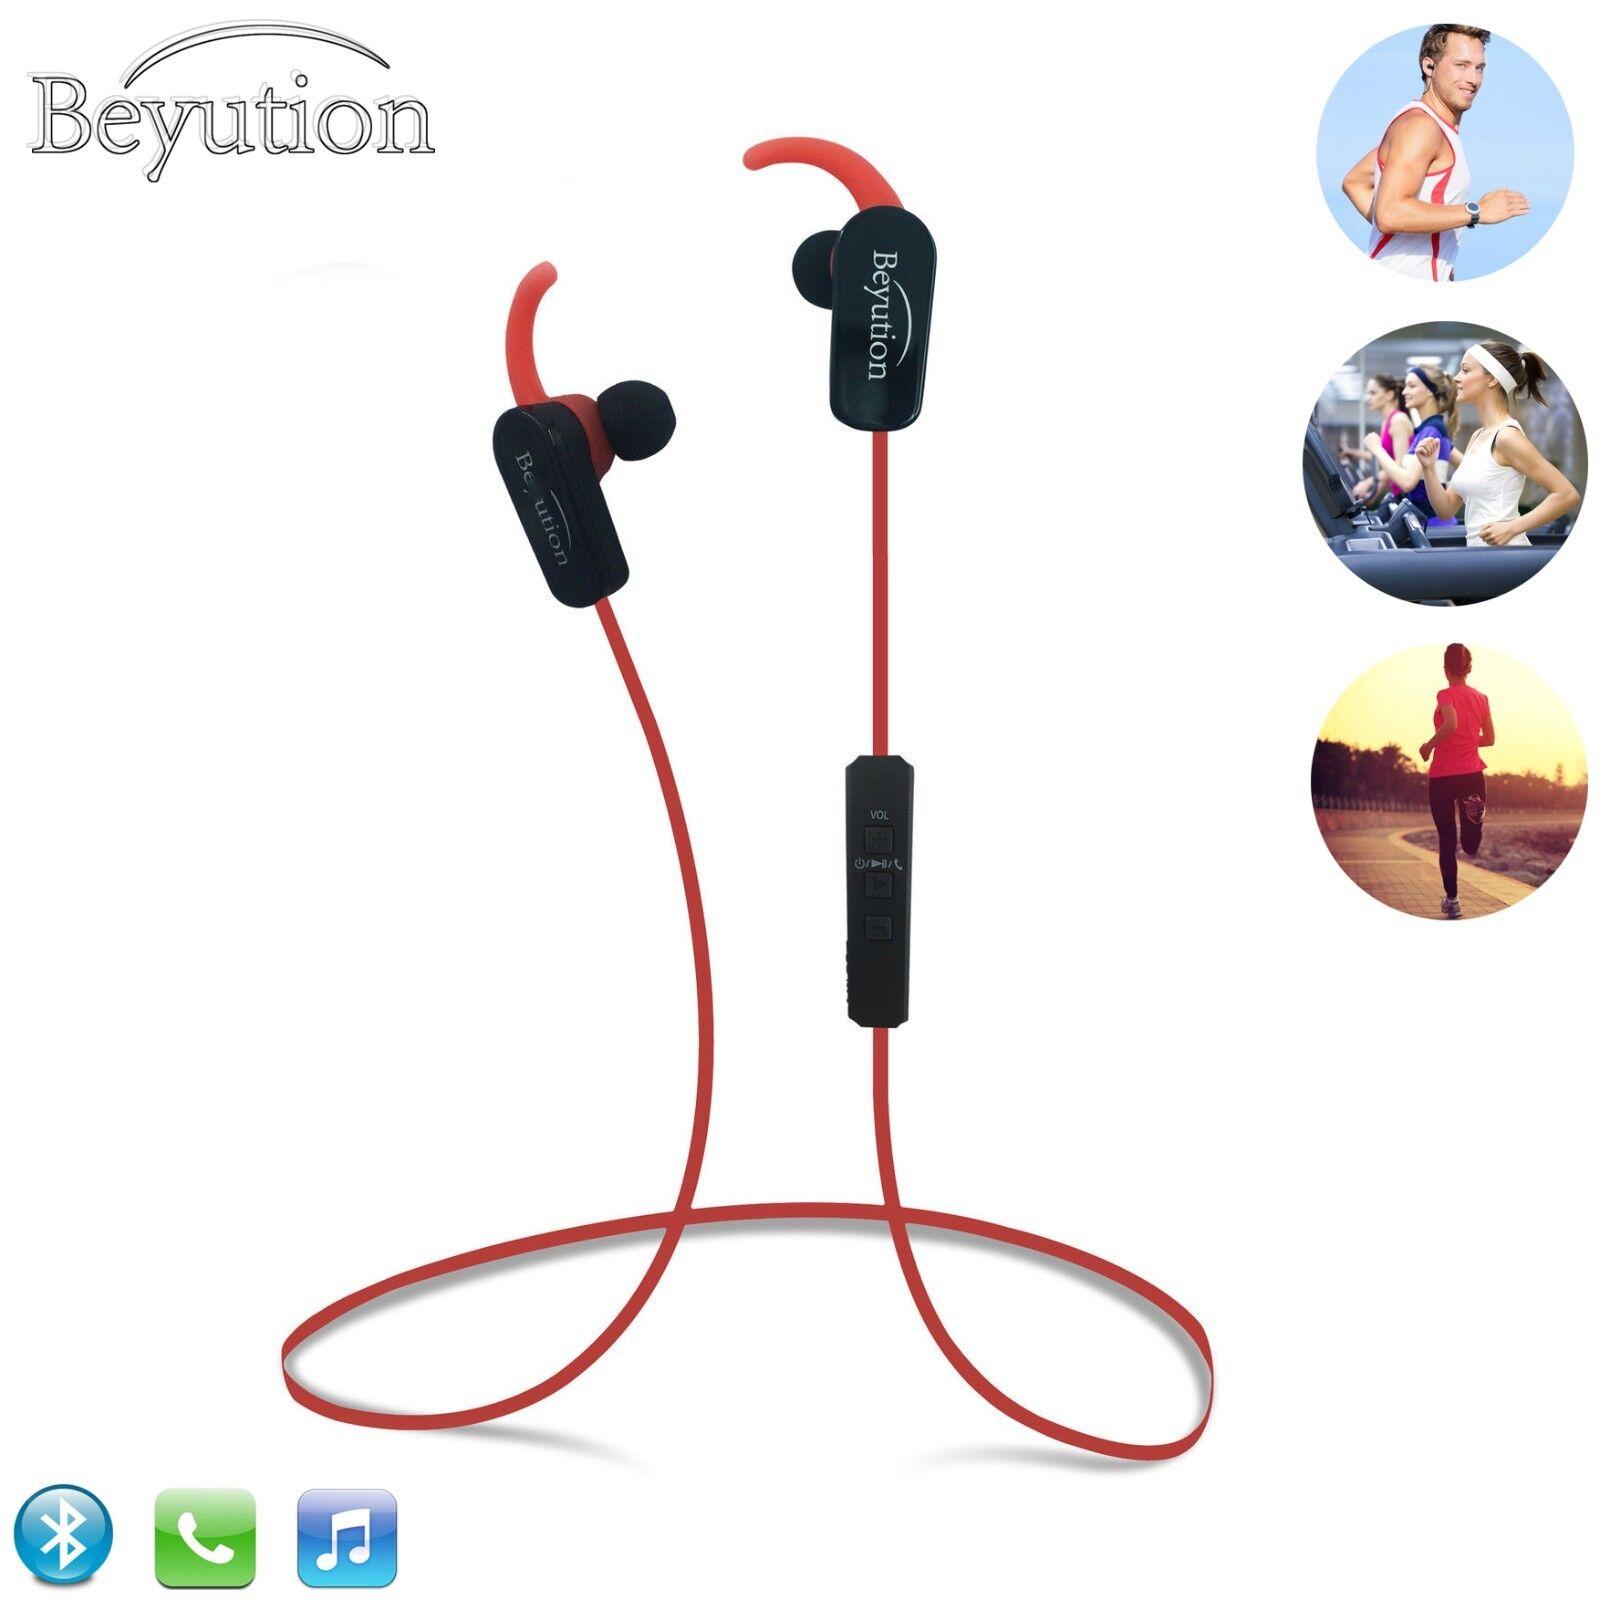 Wireless Hi-Fi Bluetooth Headphones for smart cell phones/TA